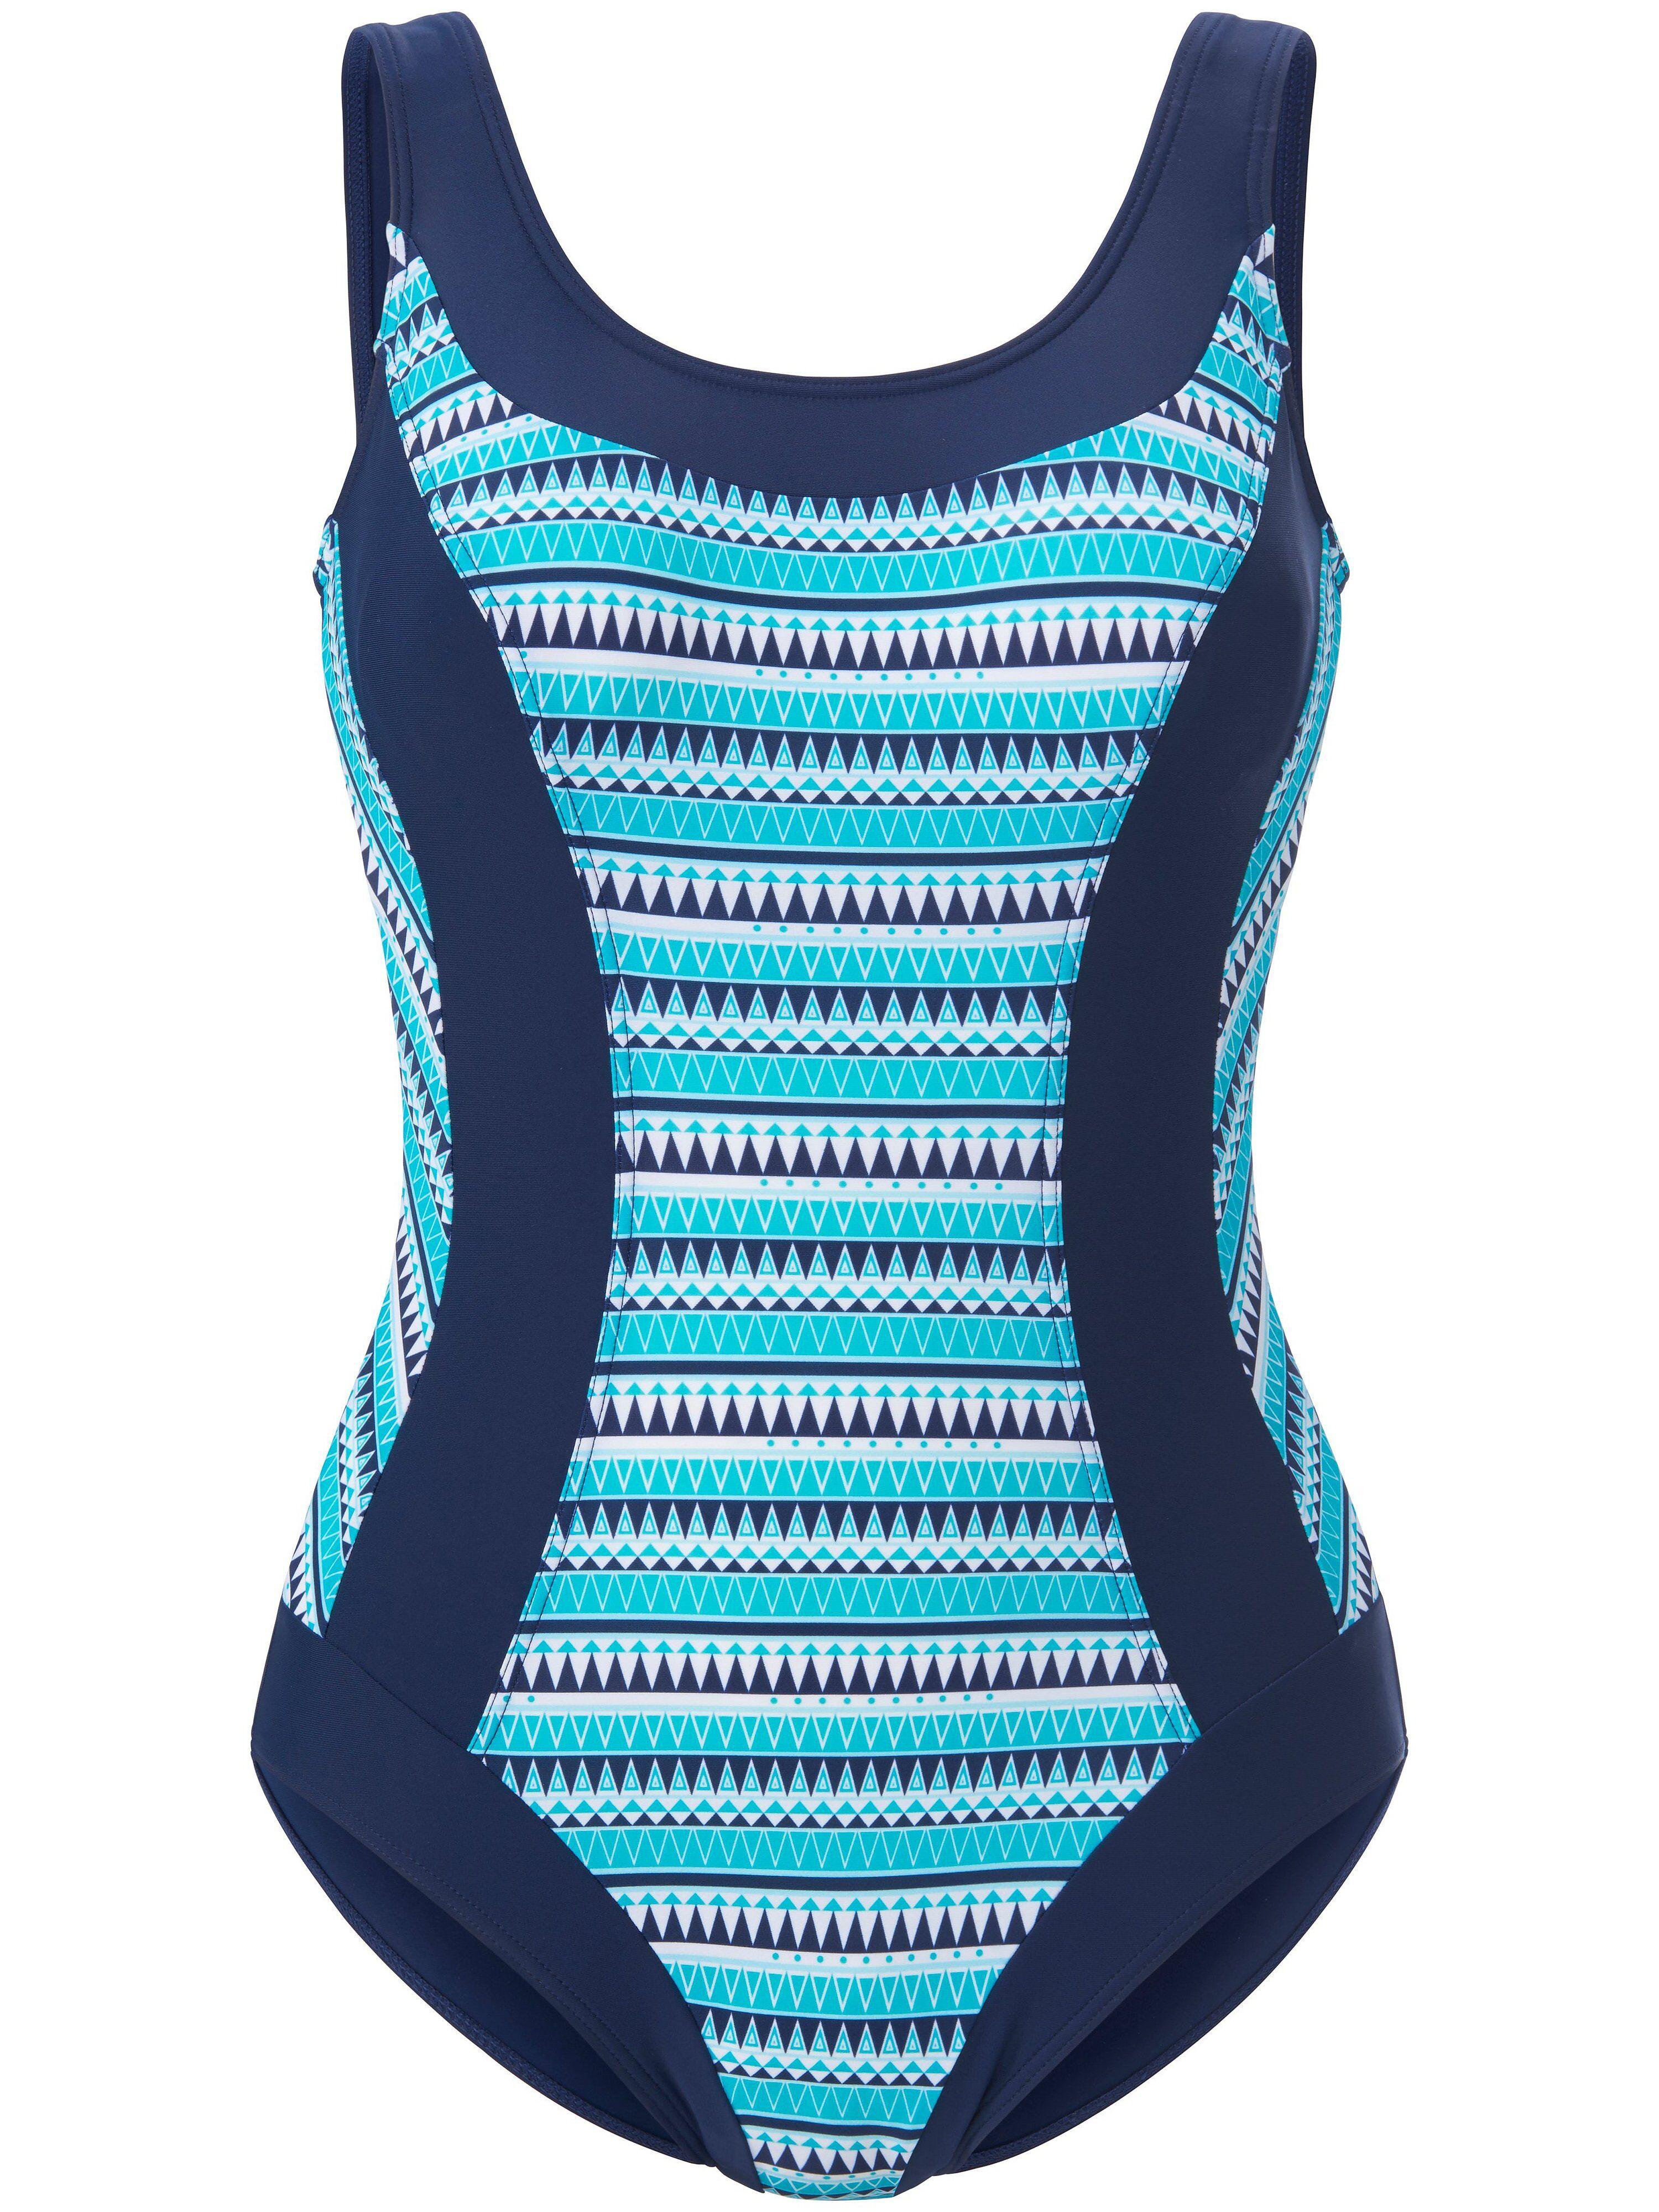 Sunmarin La maillot bain avec buste doublé  Sunmarin bleu  - Femme - 40